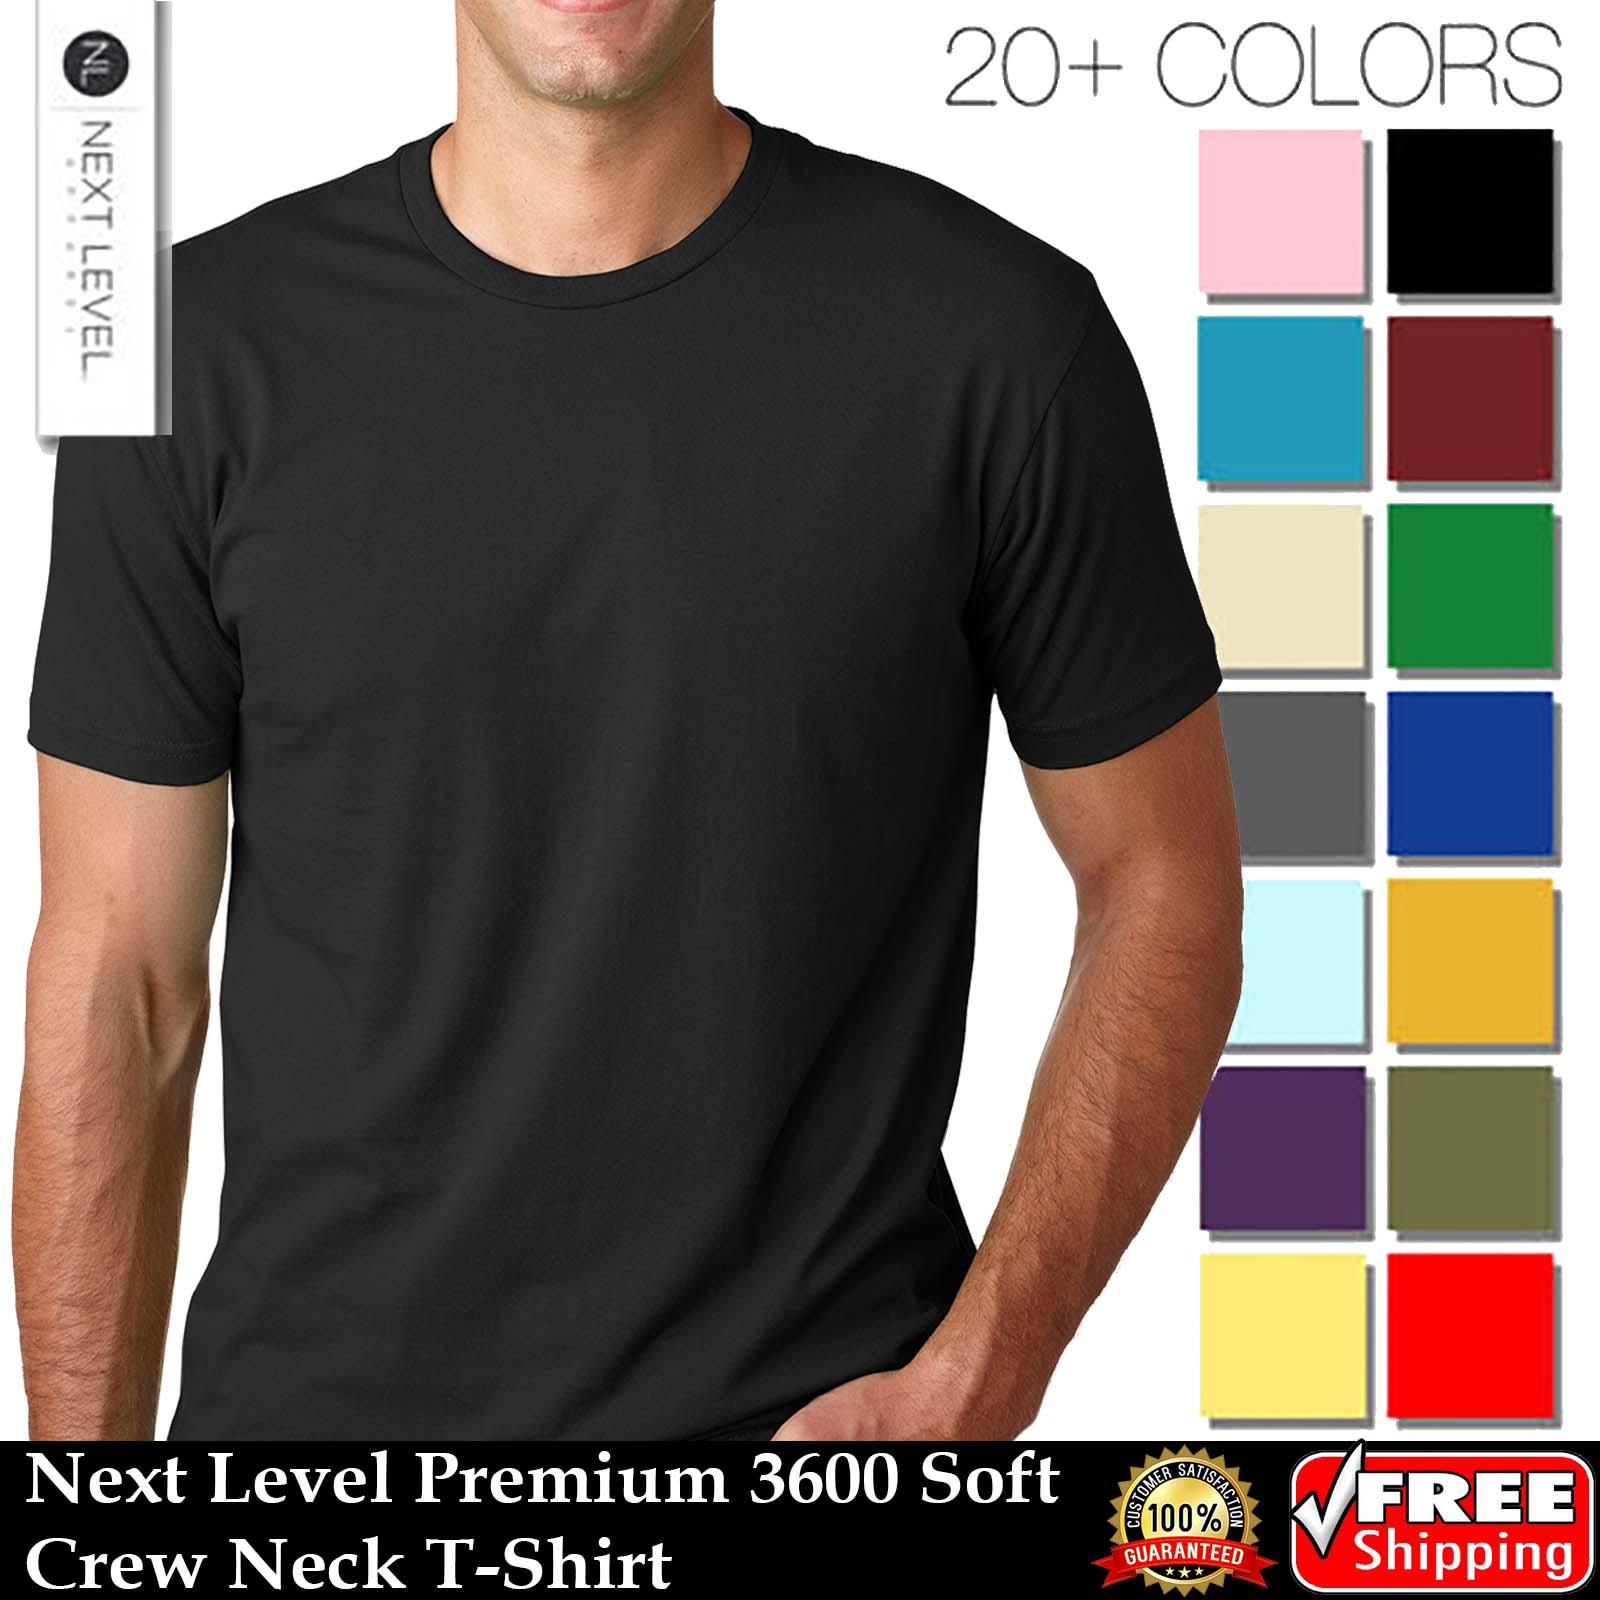 Gildan Performance Ladies 4.5 oz 100/% Polyester XS-XL T-Shirt R-G420L